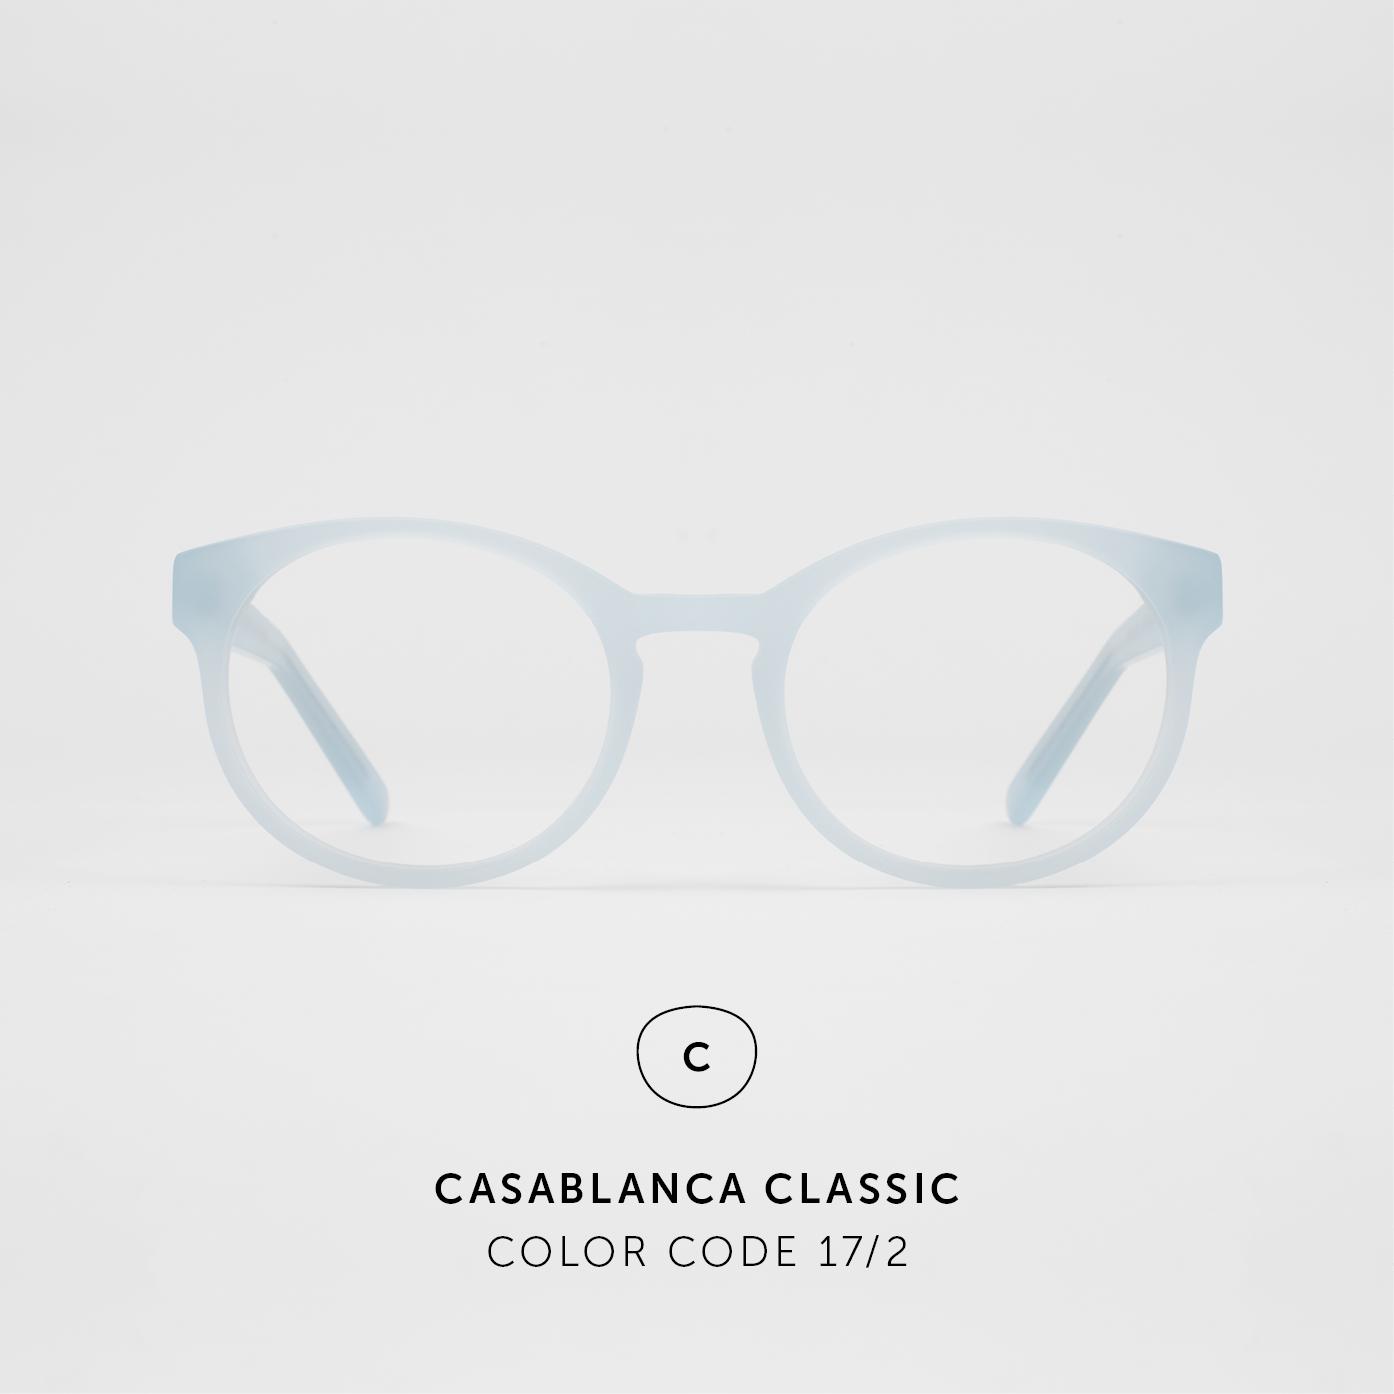 CasablancaClassic53.jpg